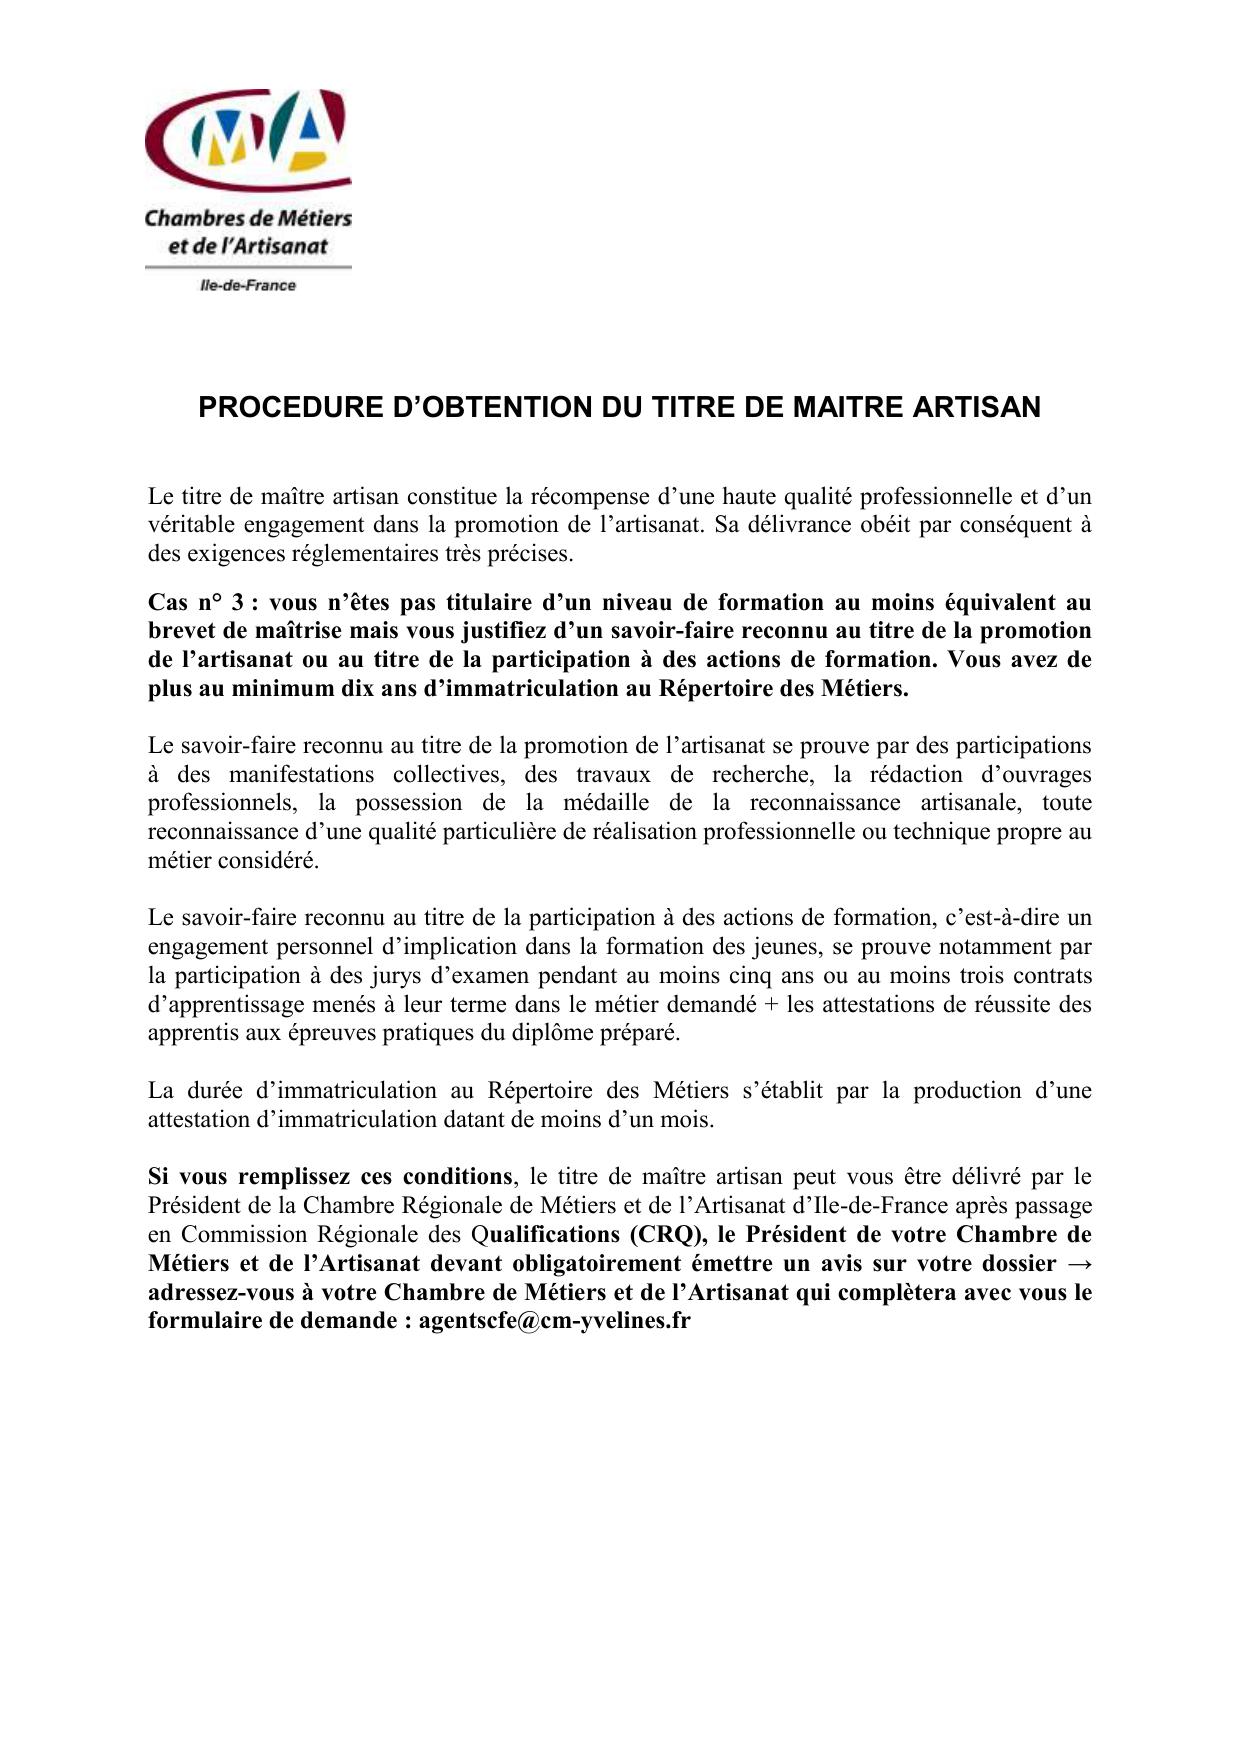 N D Immatriculation Au Repertoire Des Metiers